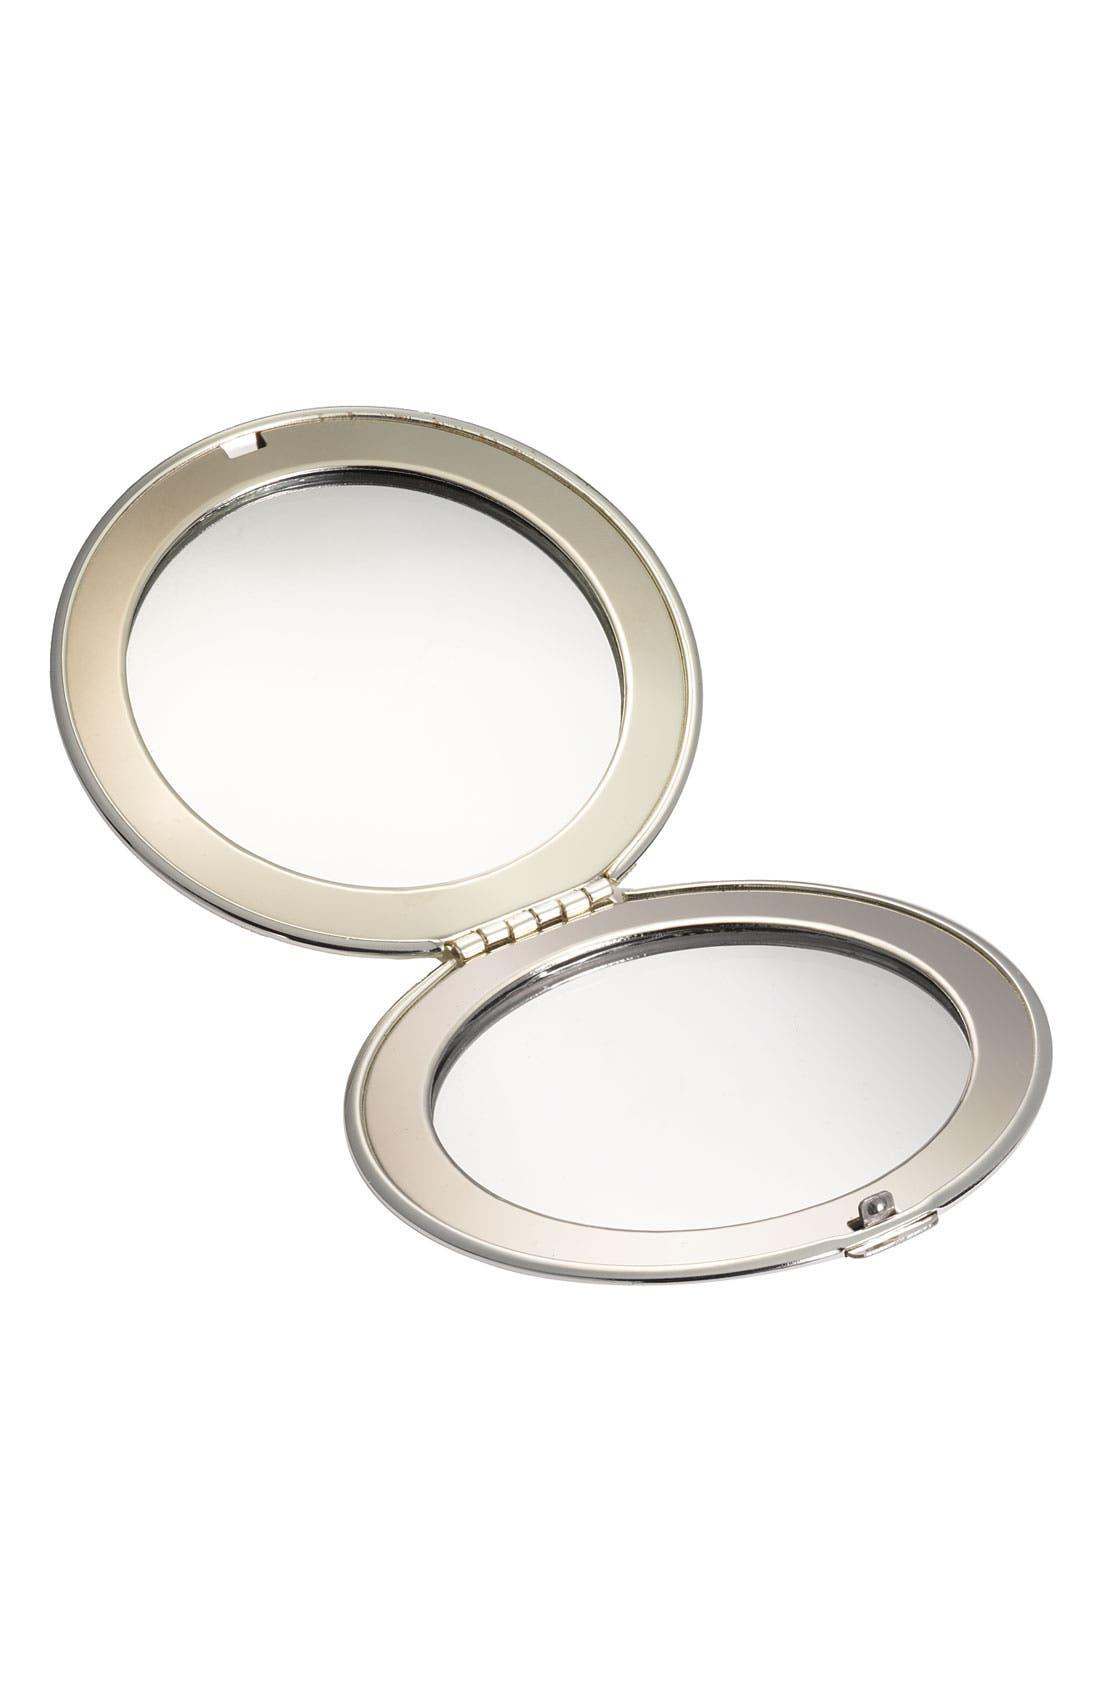 KATE SPADE NEW YORK, hello sunshine compact mirror, Alternate thumbnail 3, color, 040